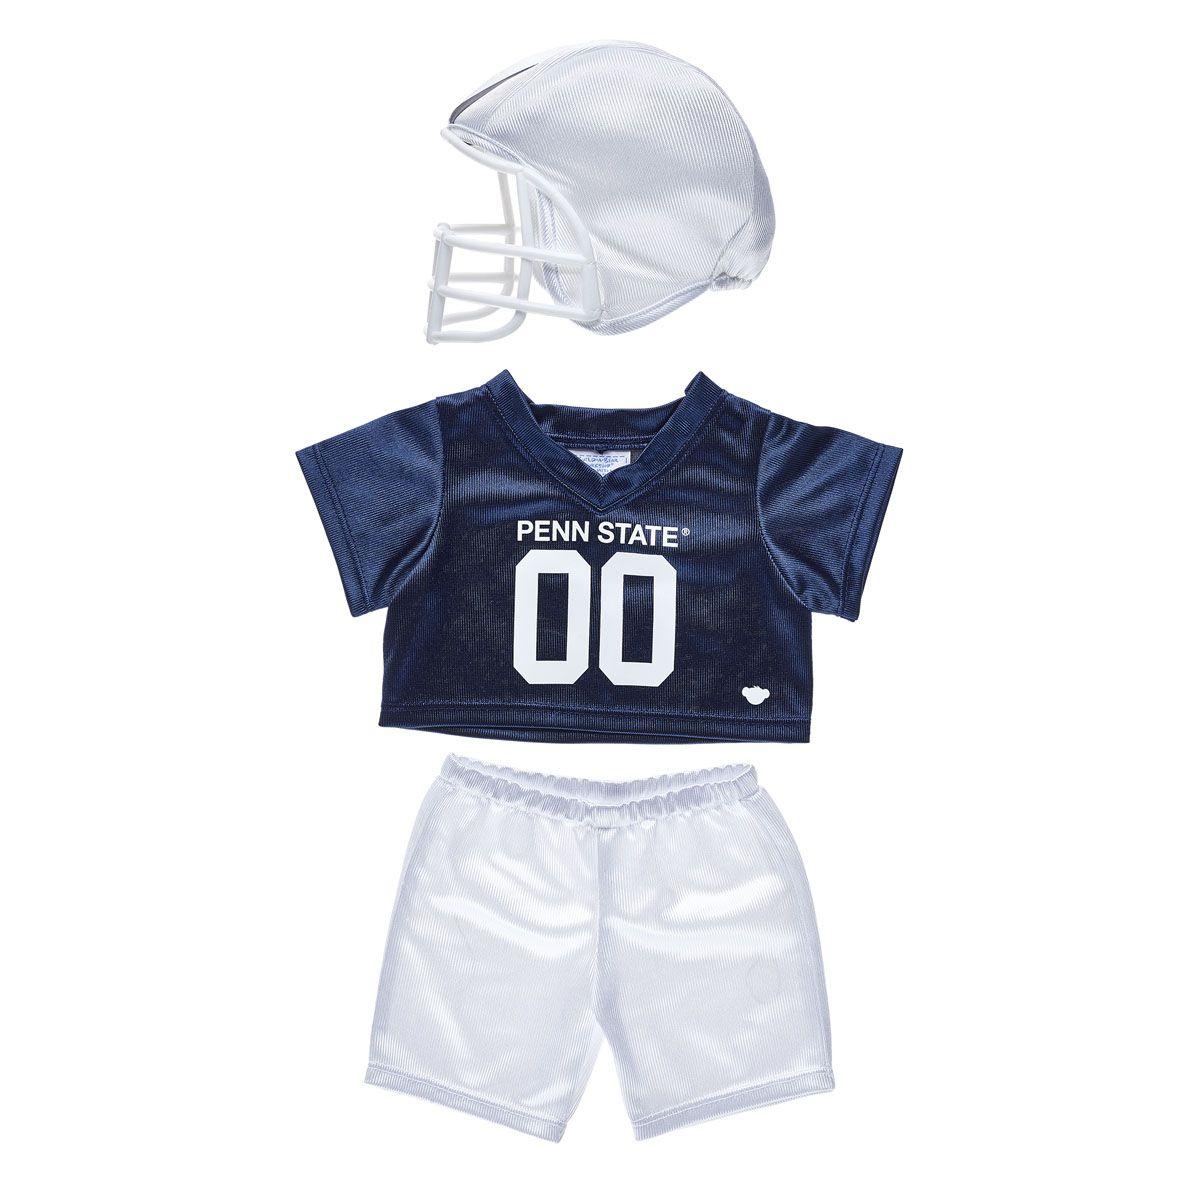 Pennsylvania State University Fan Set 3 Pc Products In 2019 Pennsylvania State University Sports Uniforms Football Uniforms